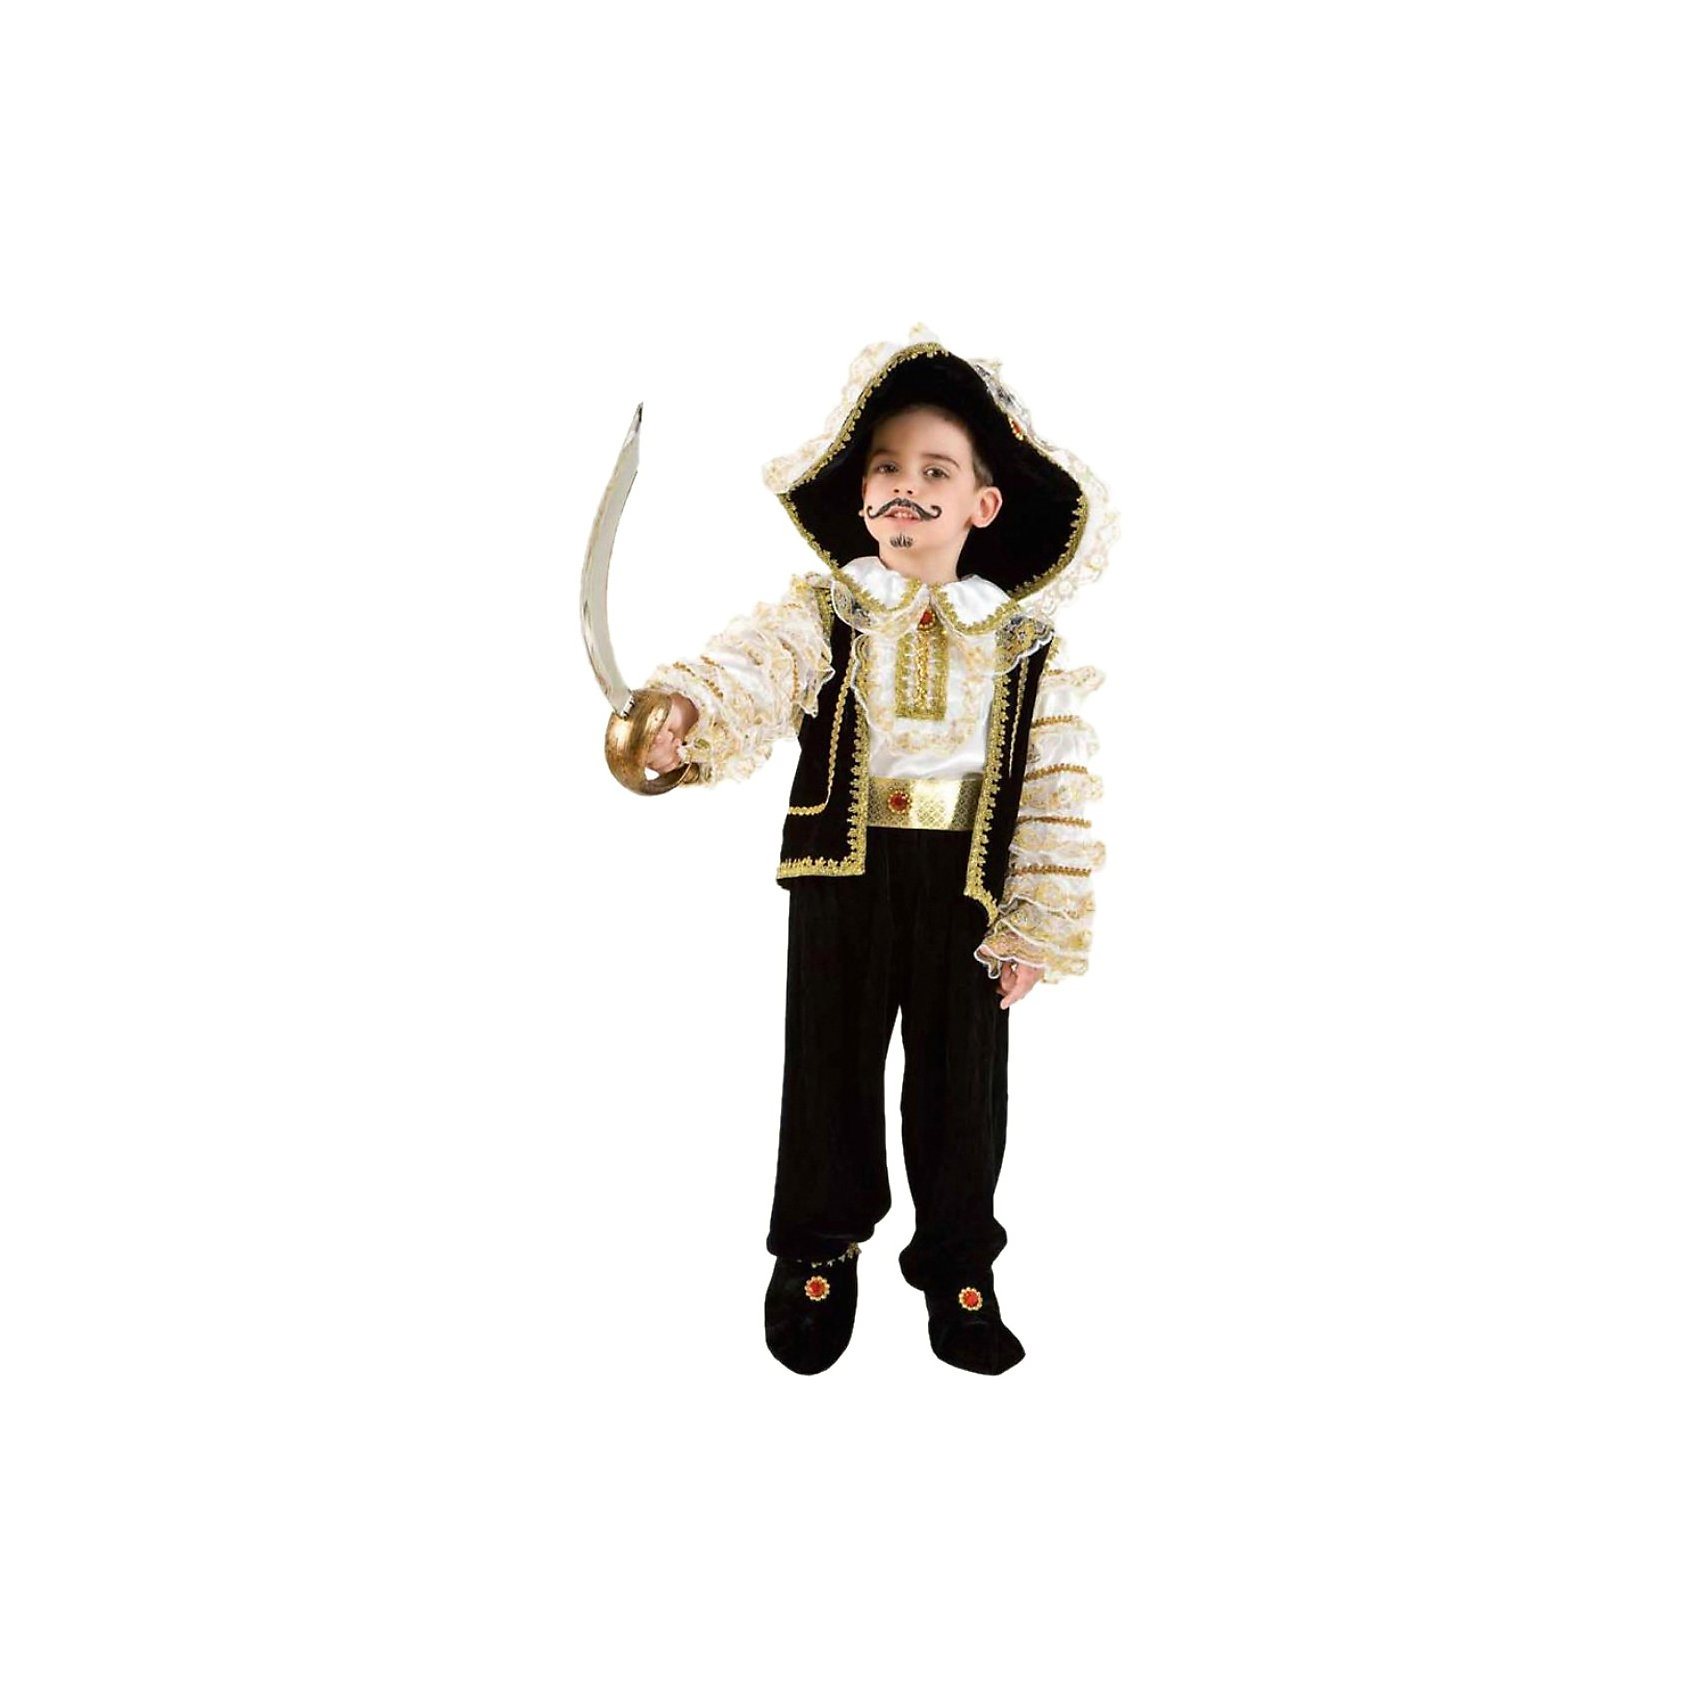 Карнавальный костюм Корсар, Veneziano